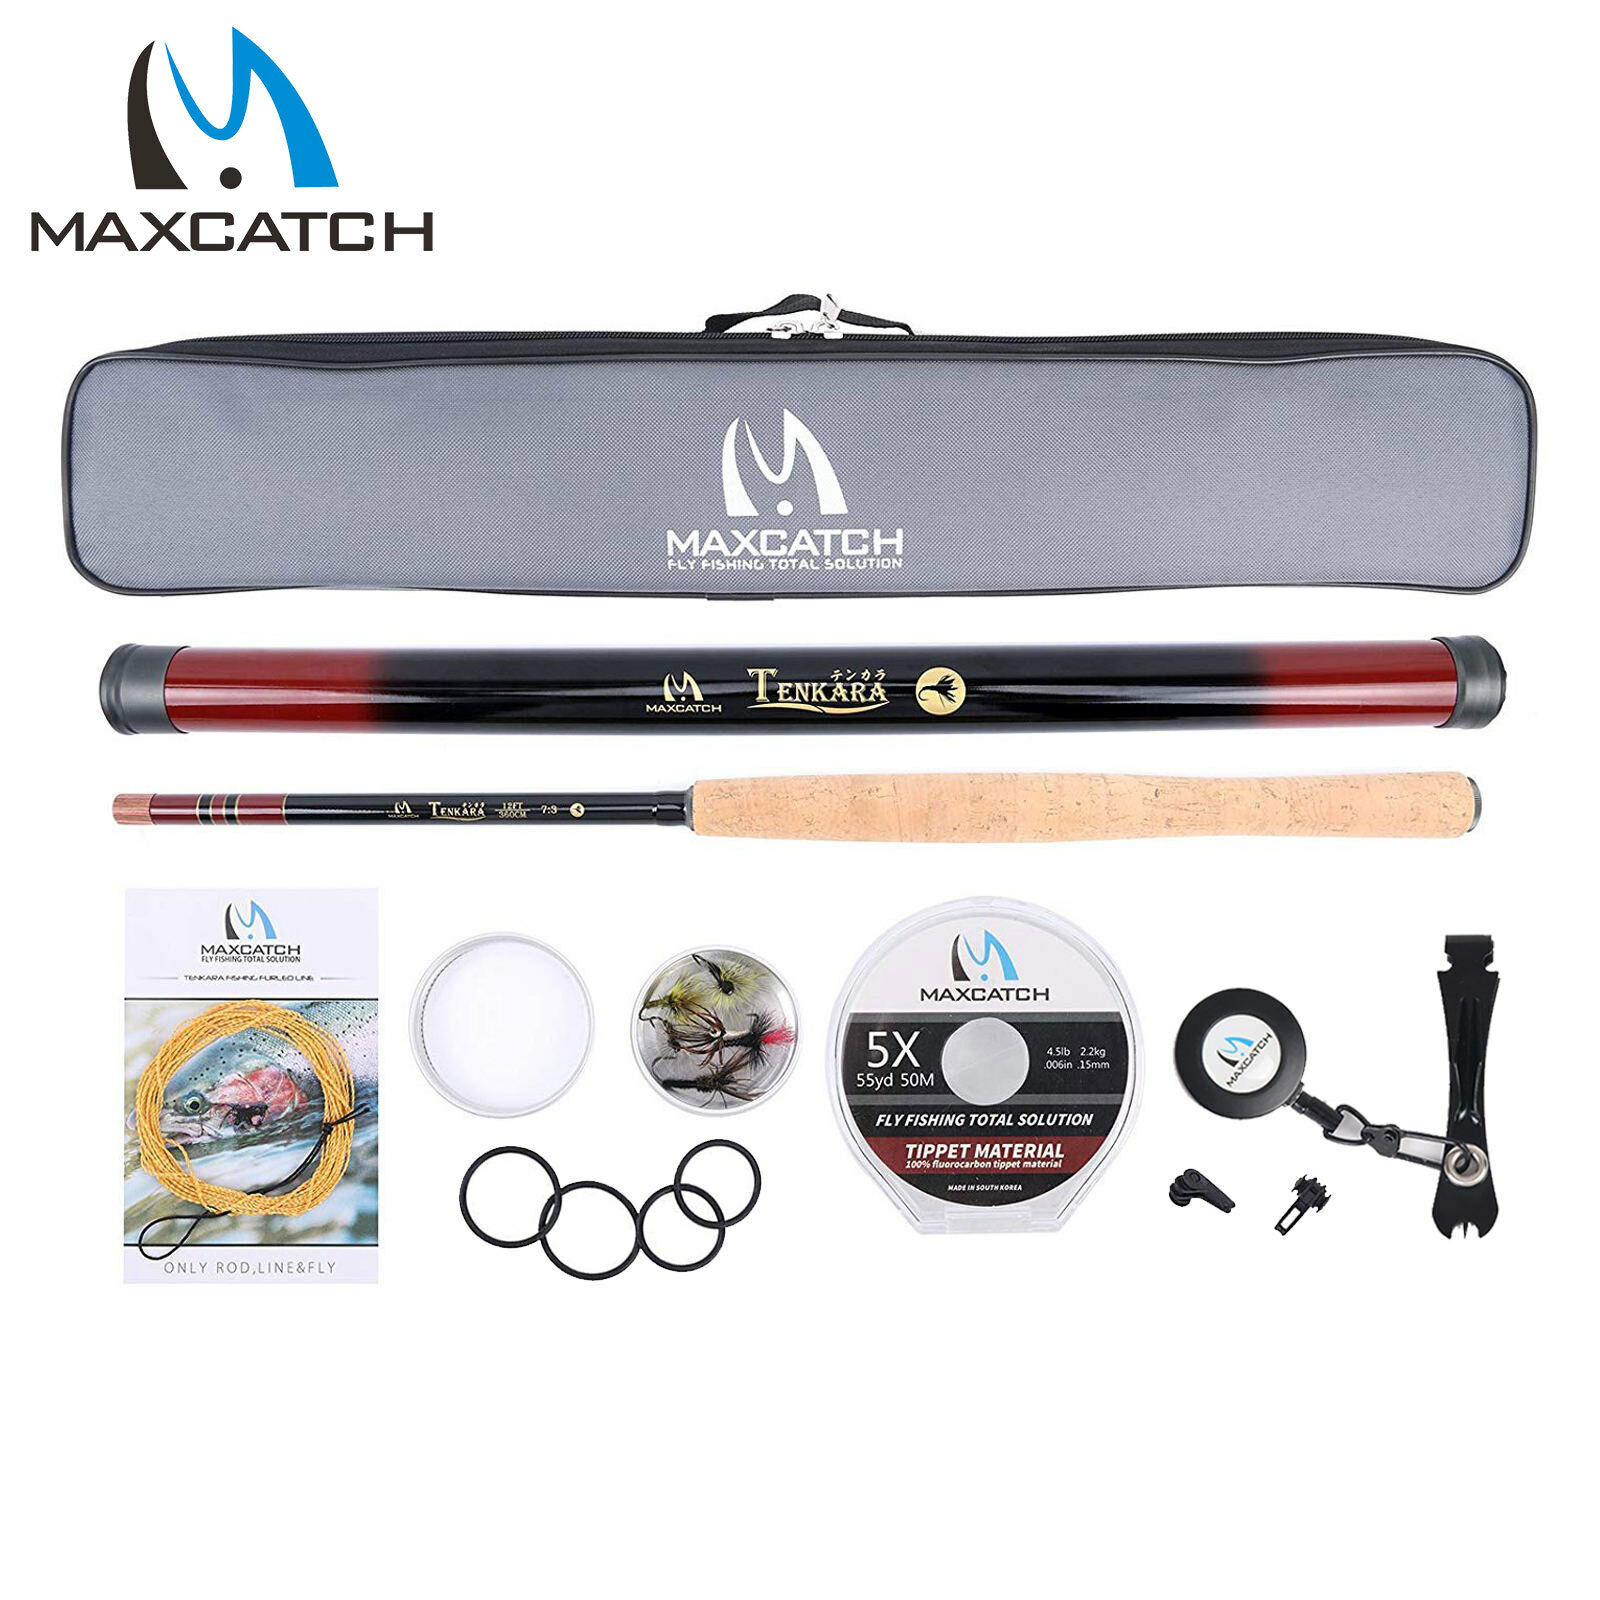 Maxcatch Tenkara Rod Combo Complete Kit 10111213ft 7 3 Action Fly Fishing Rod